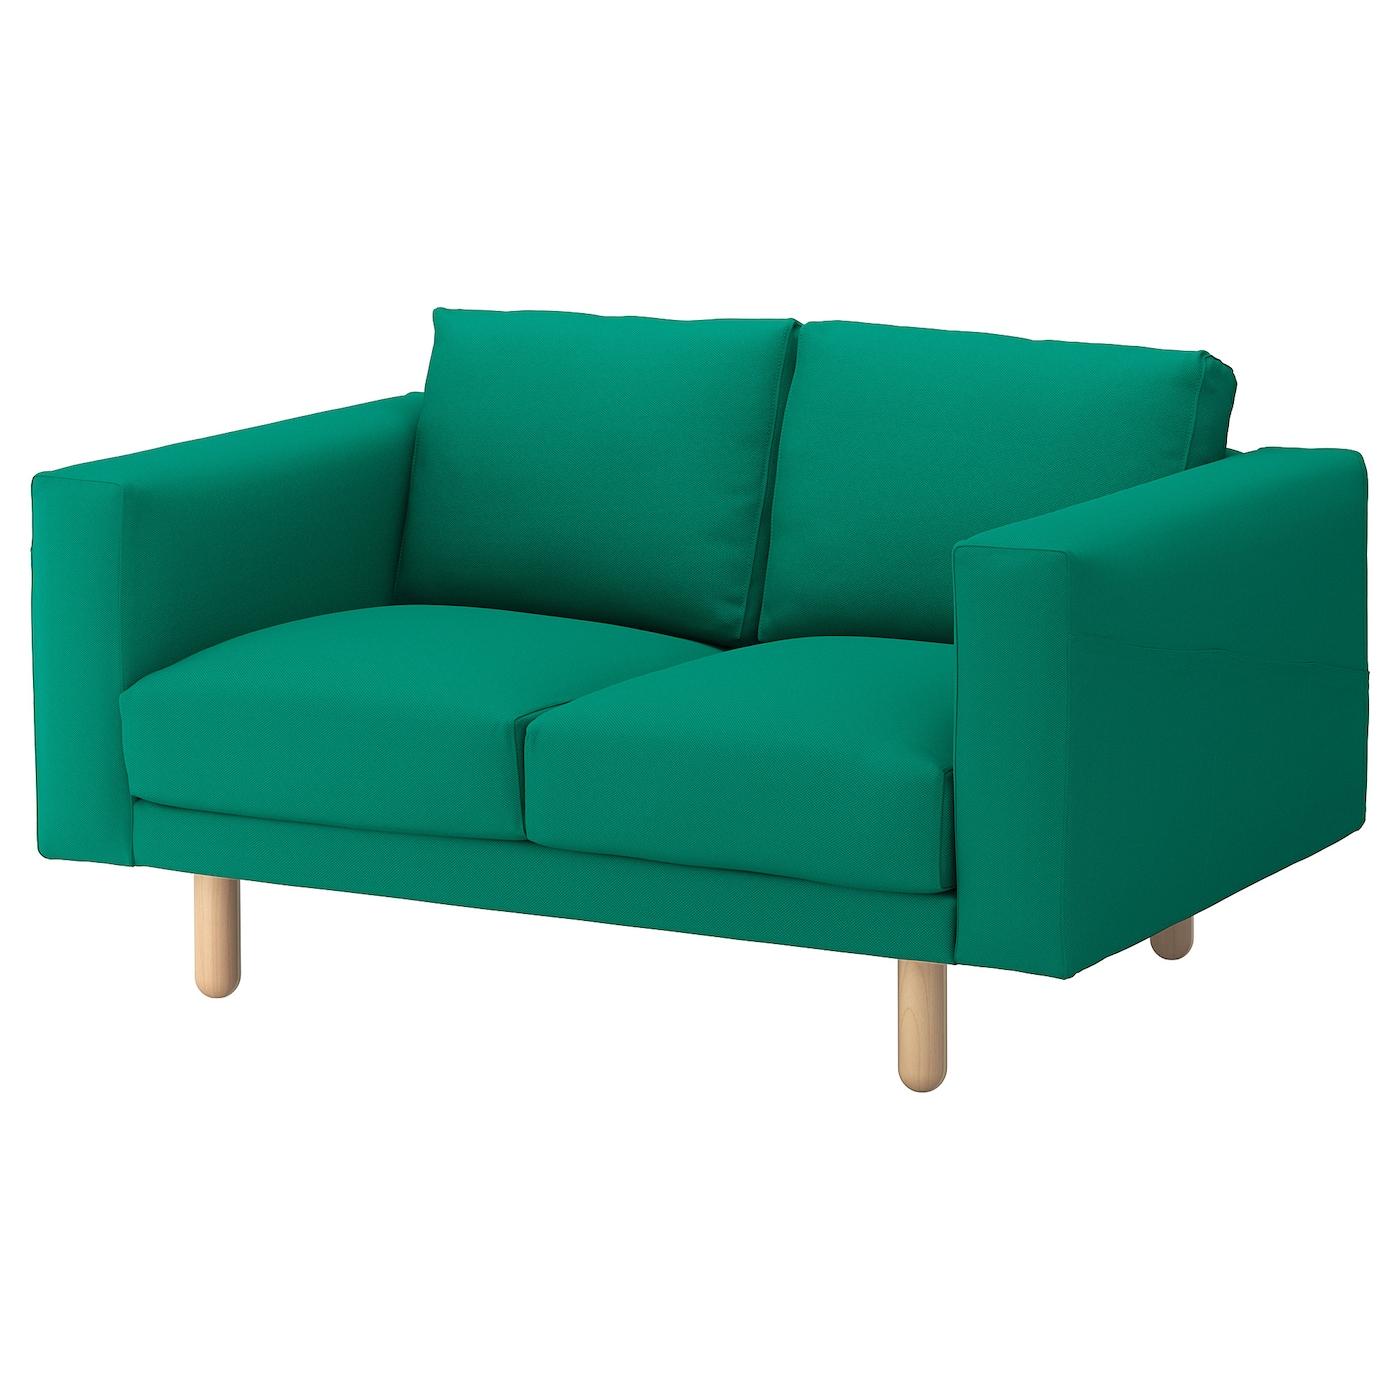 Sofaüberwurf Ikea green futon ikea green color 100 images sofa beds ikea